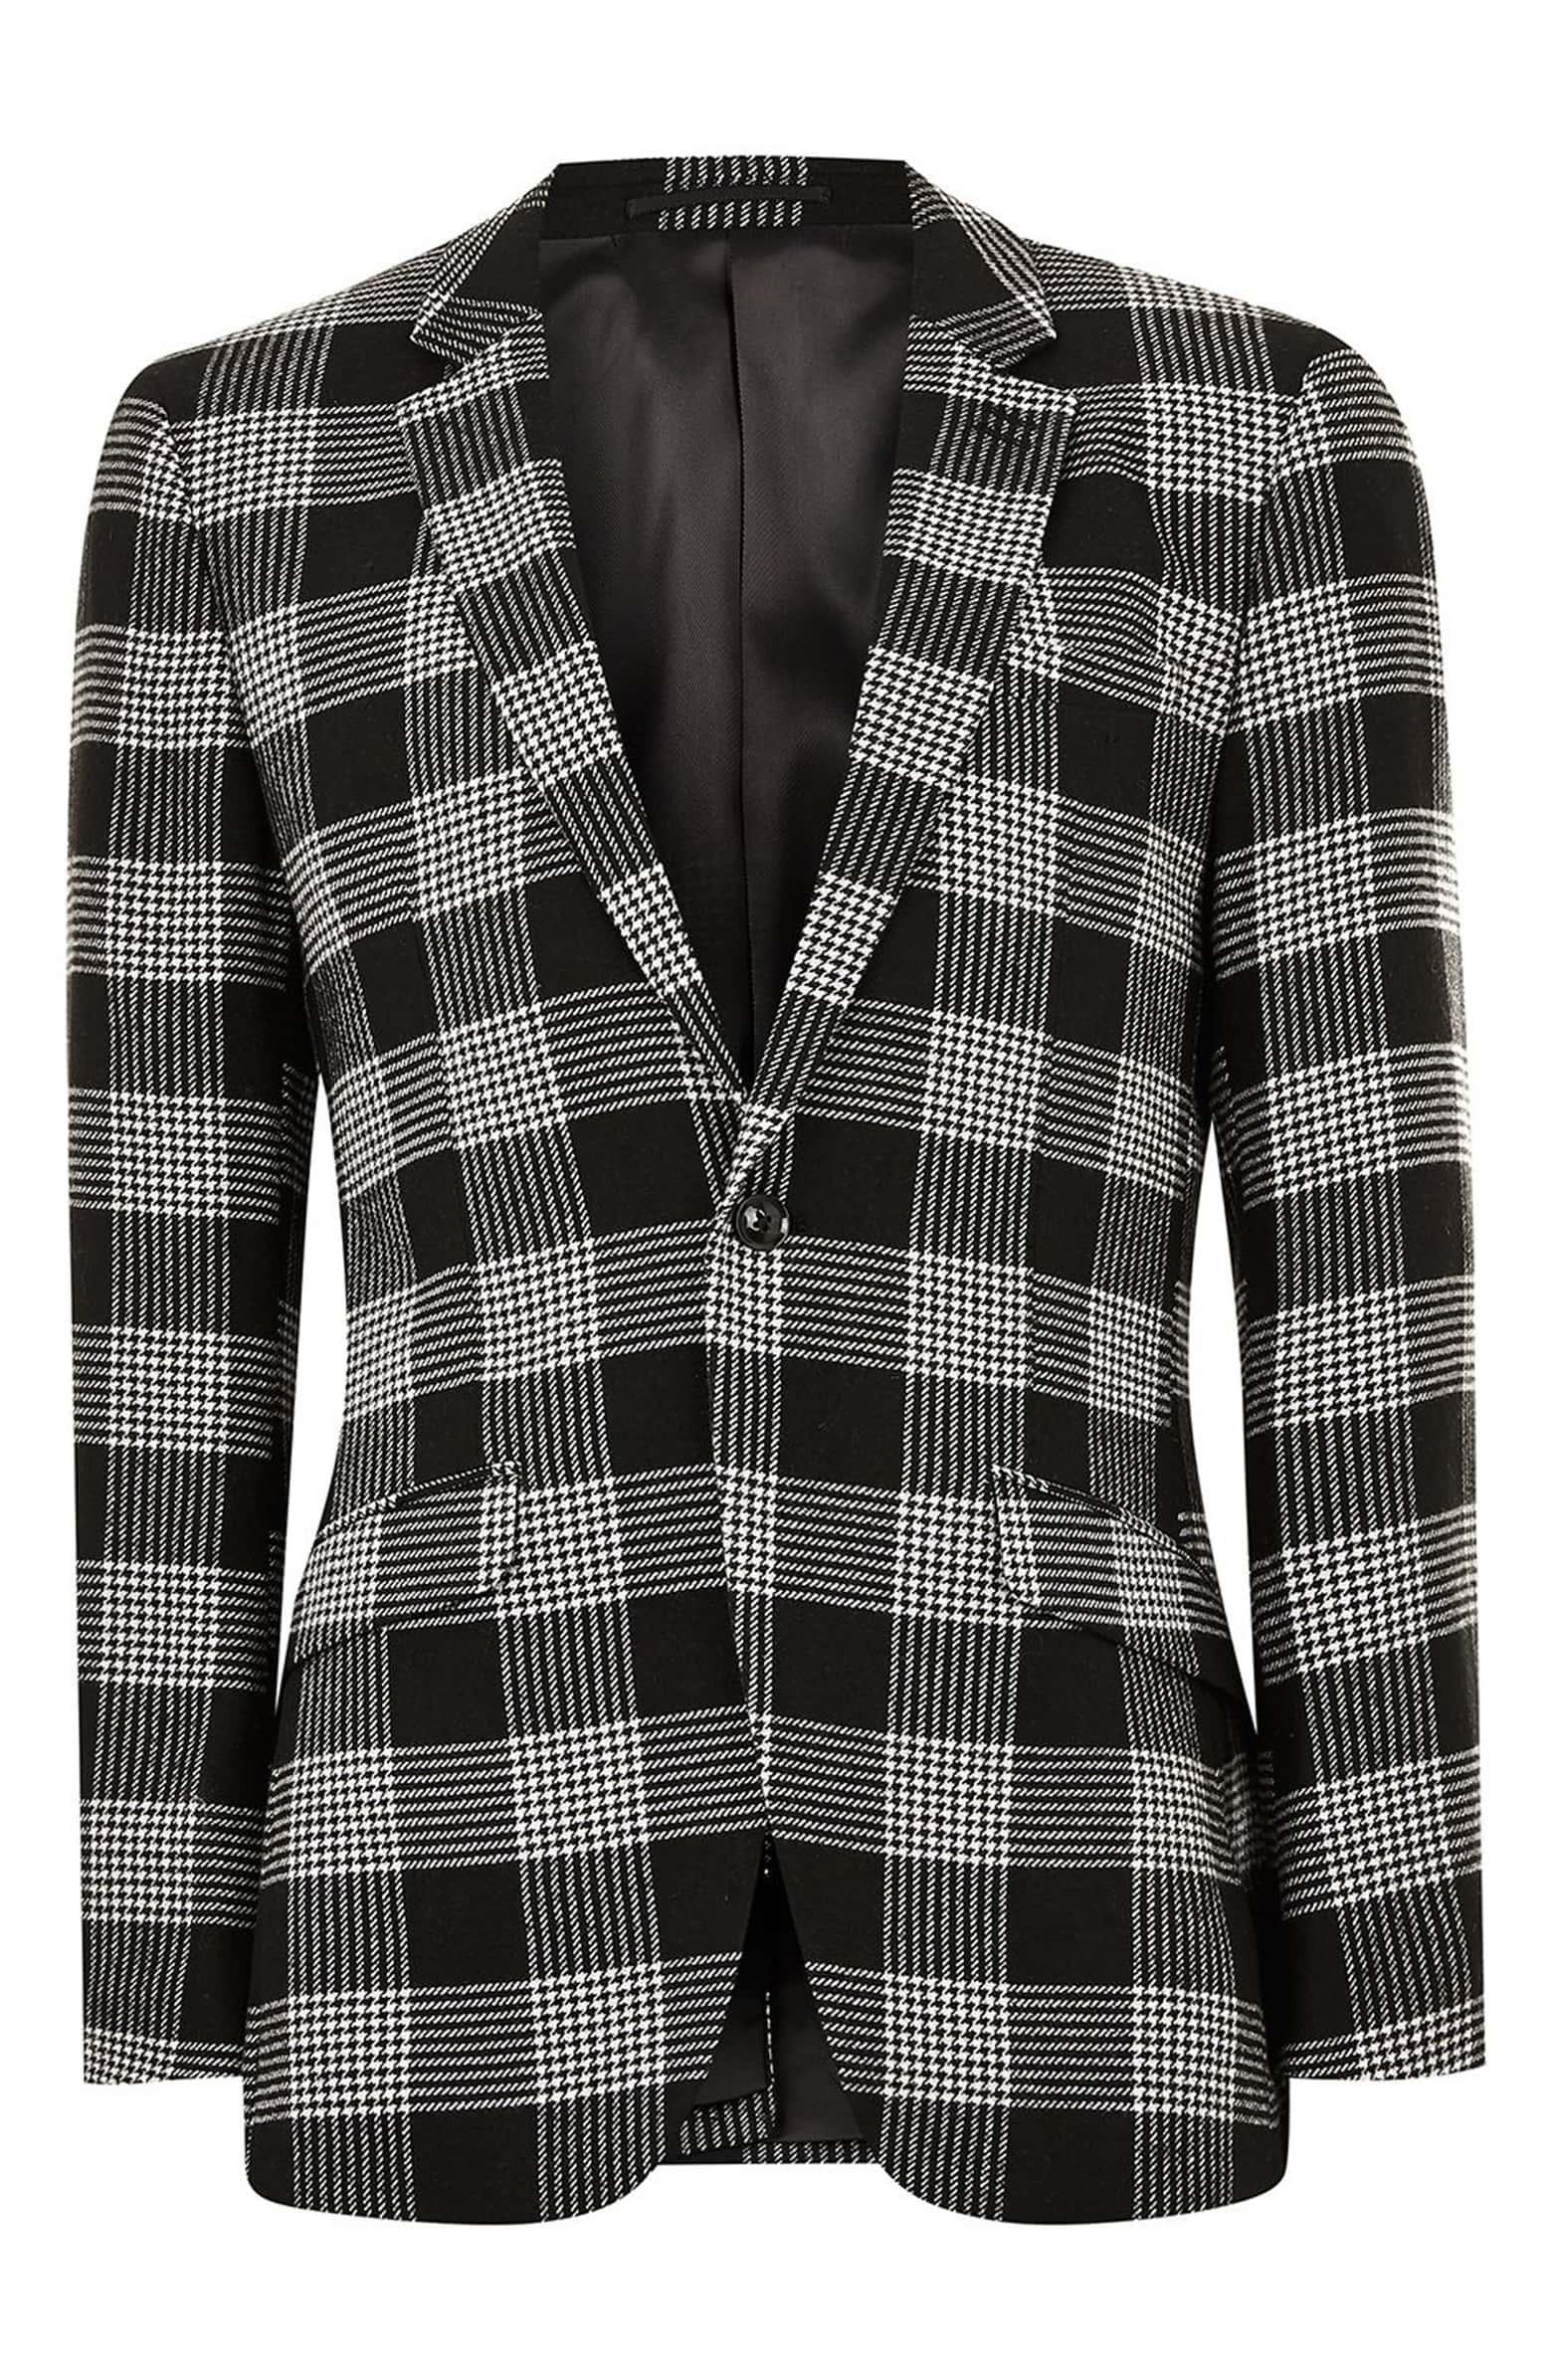 Topman Black and White Plaid Blazer.jpeg